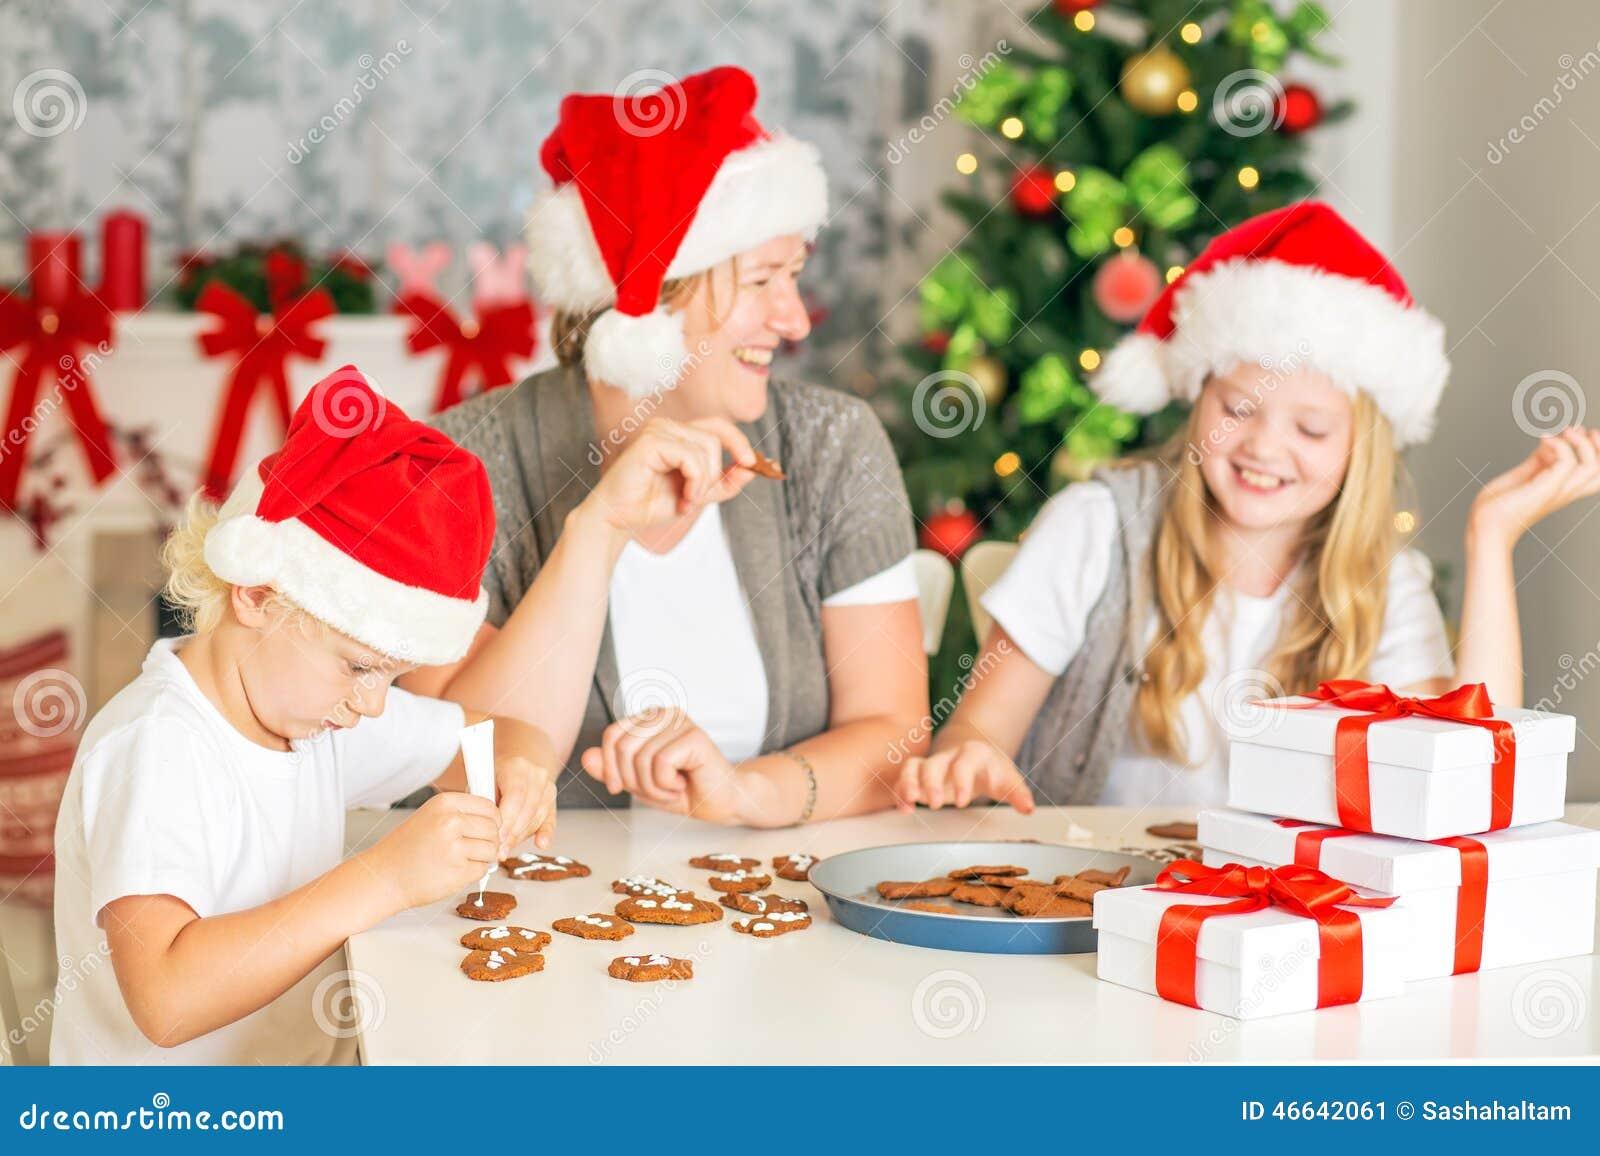 Happy Family Baking Christmas Cookies Stock Photo - Image: 46642061